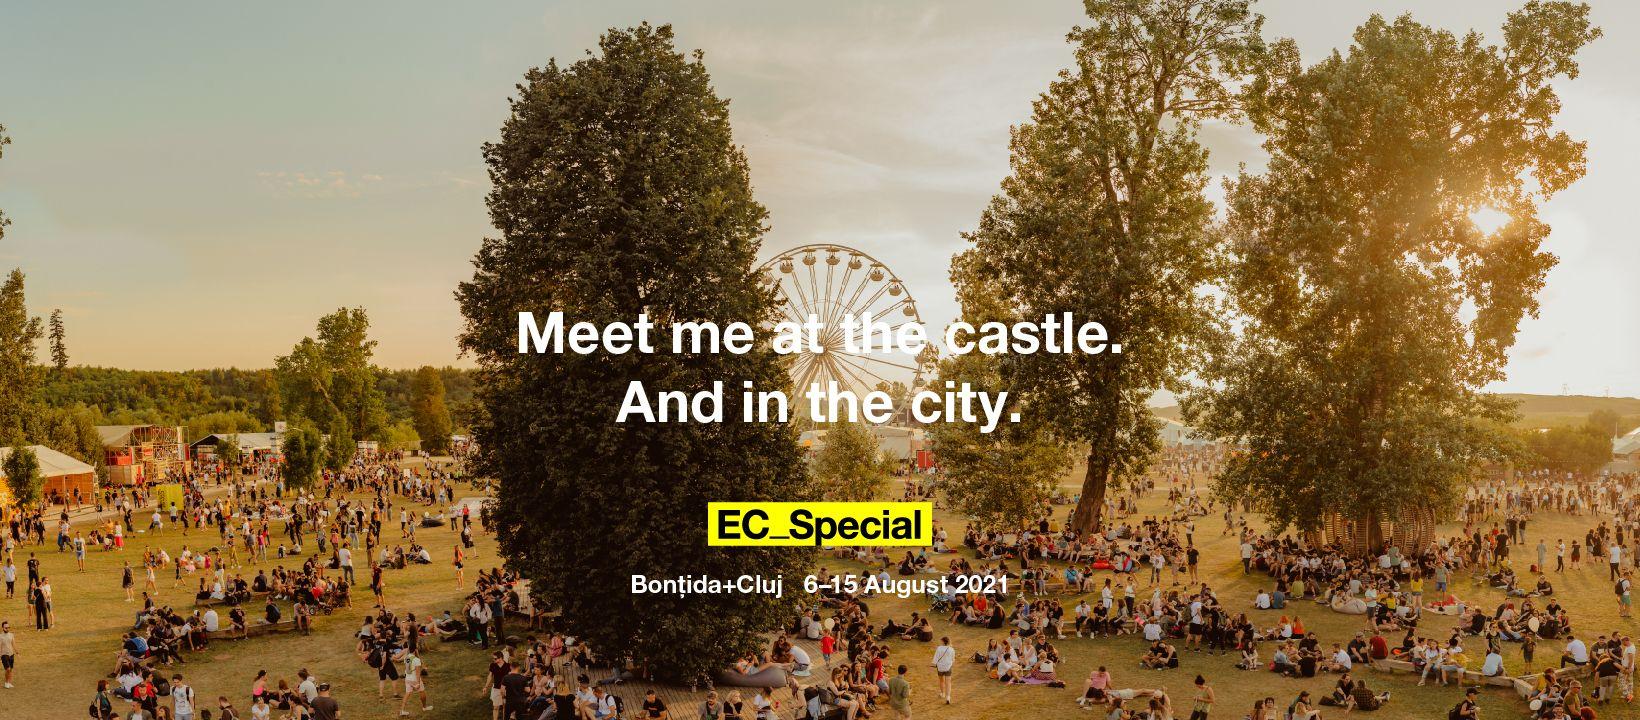 ec_special 2021 august